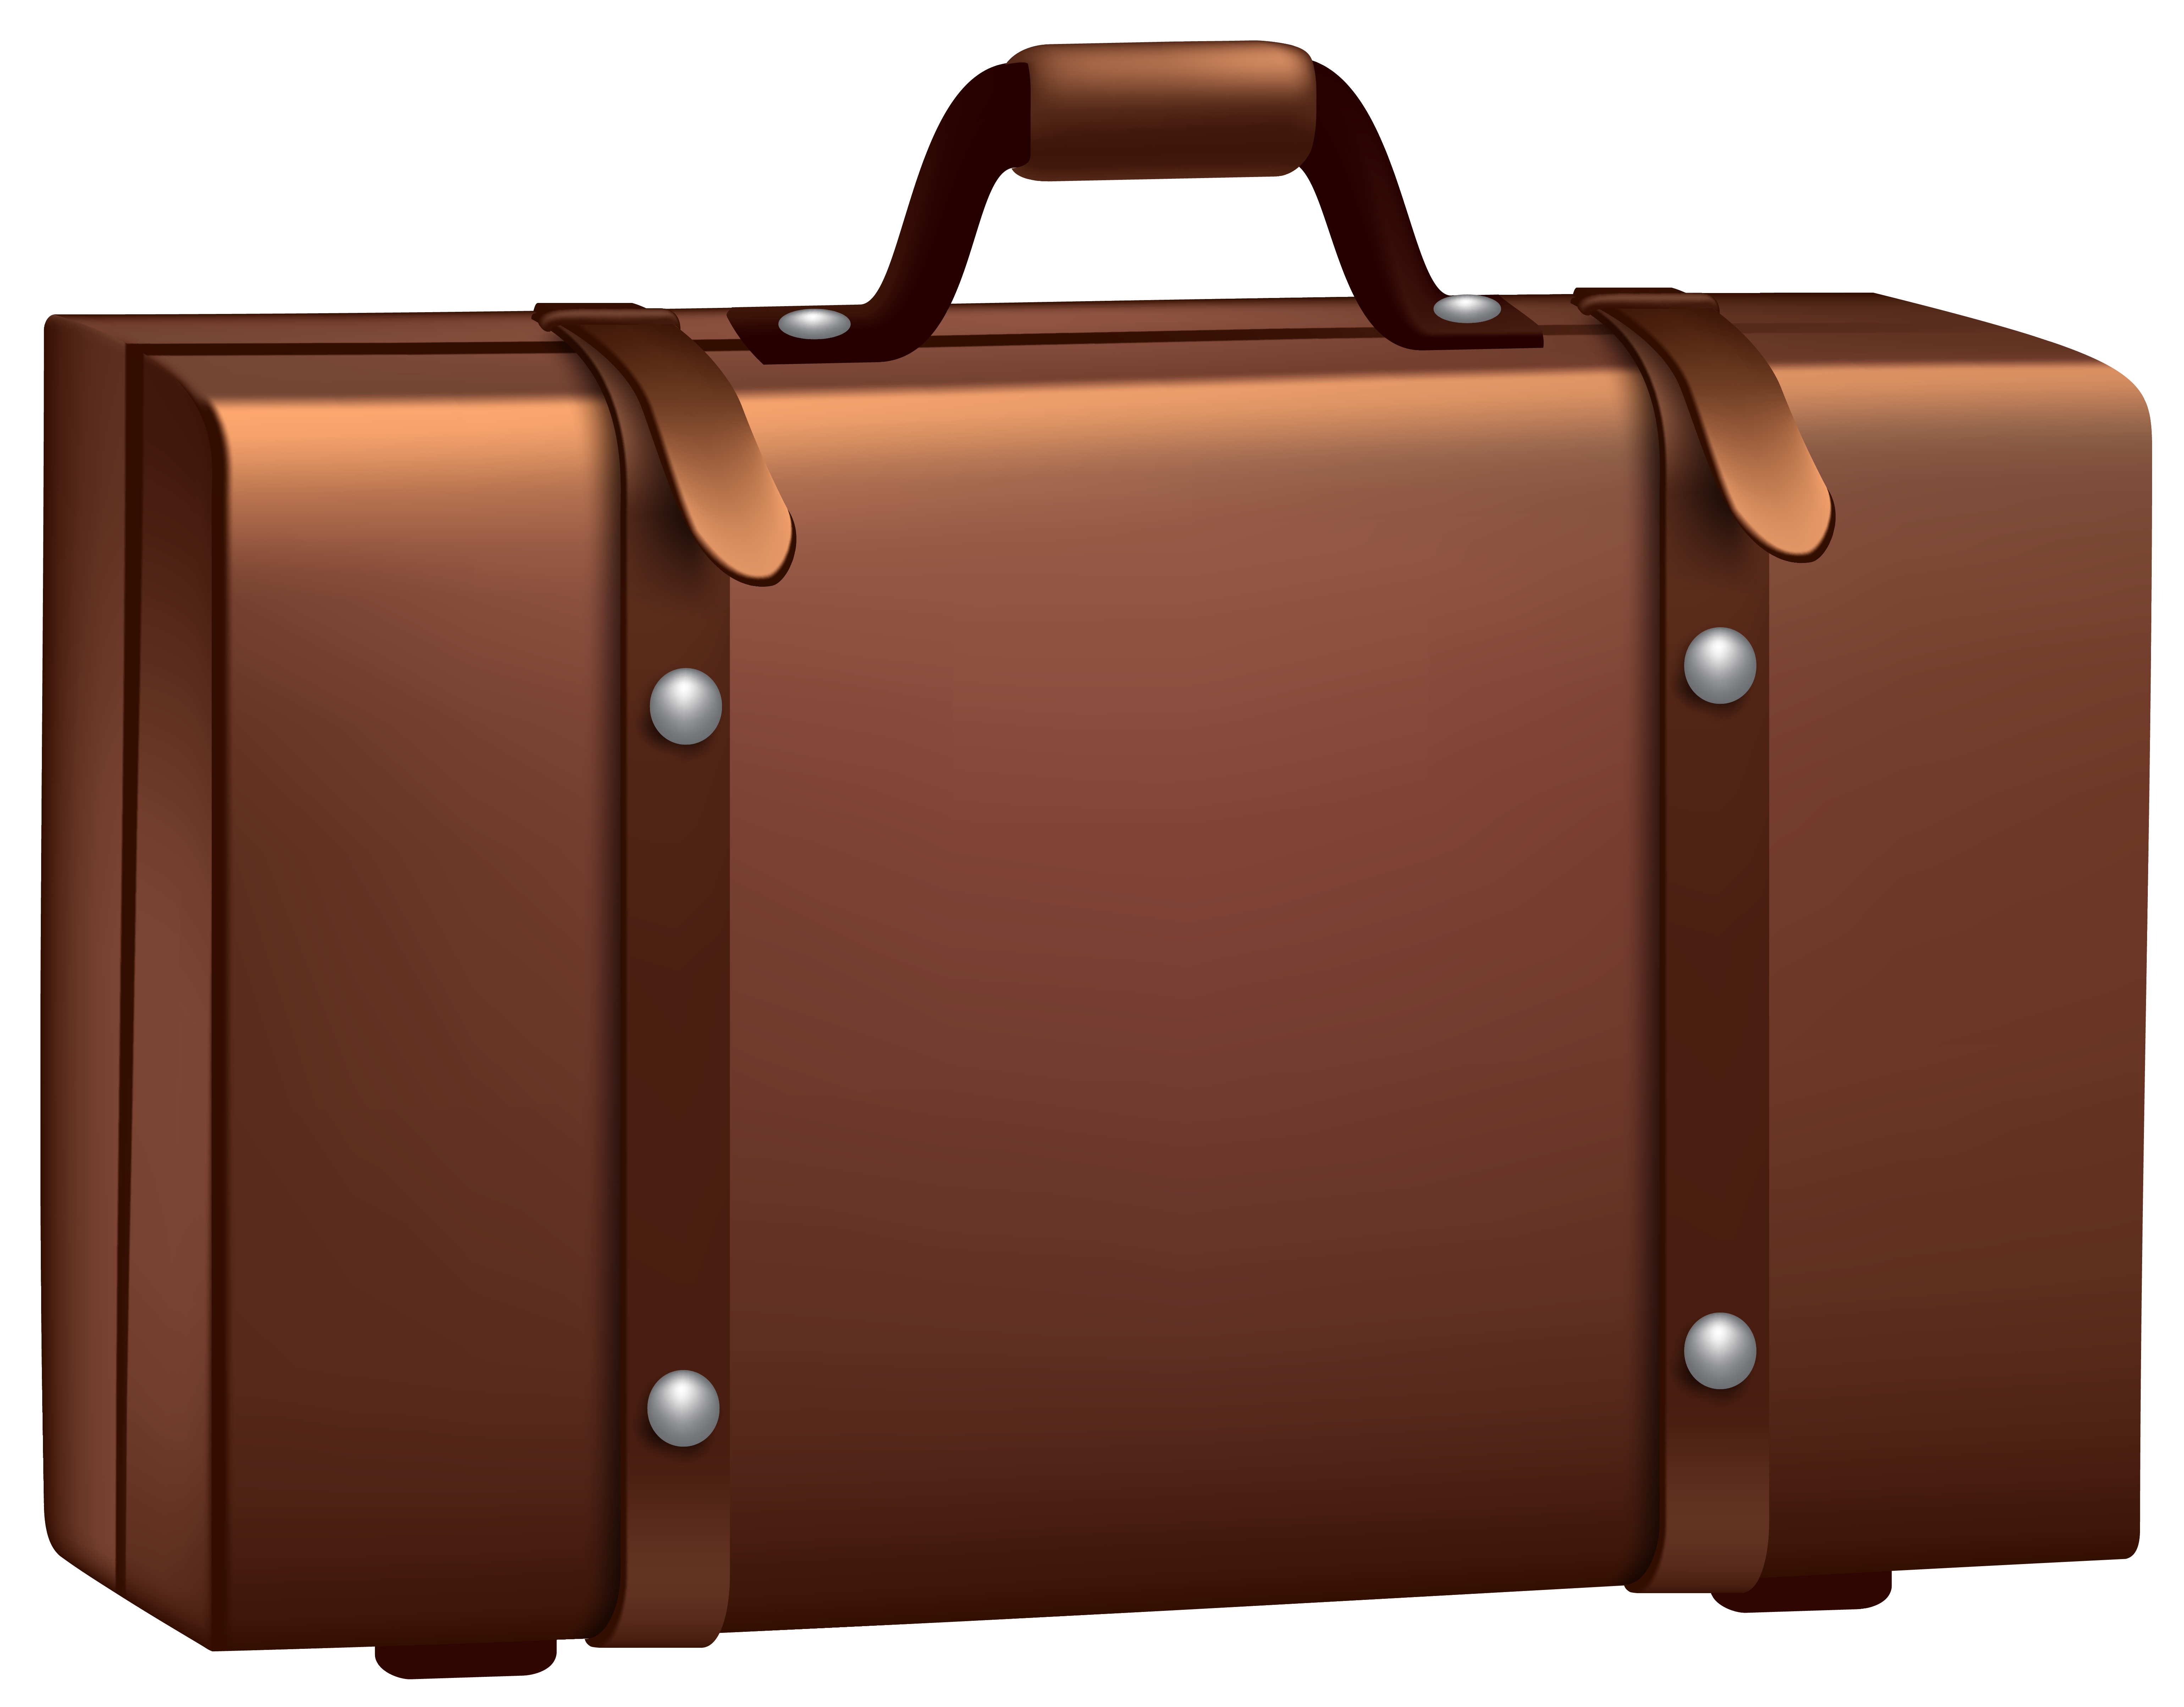 clipart transparent download Brown suitcase png clip. Briefcase clipart